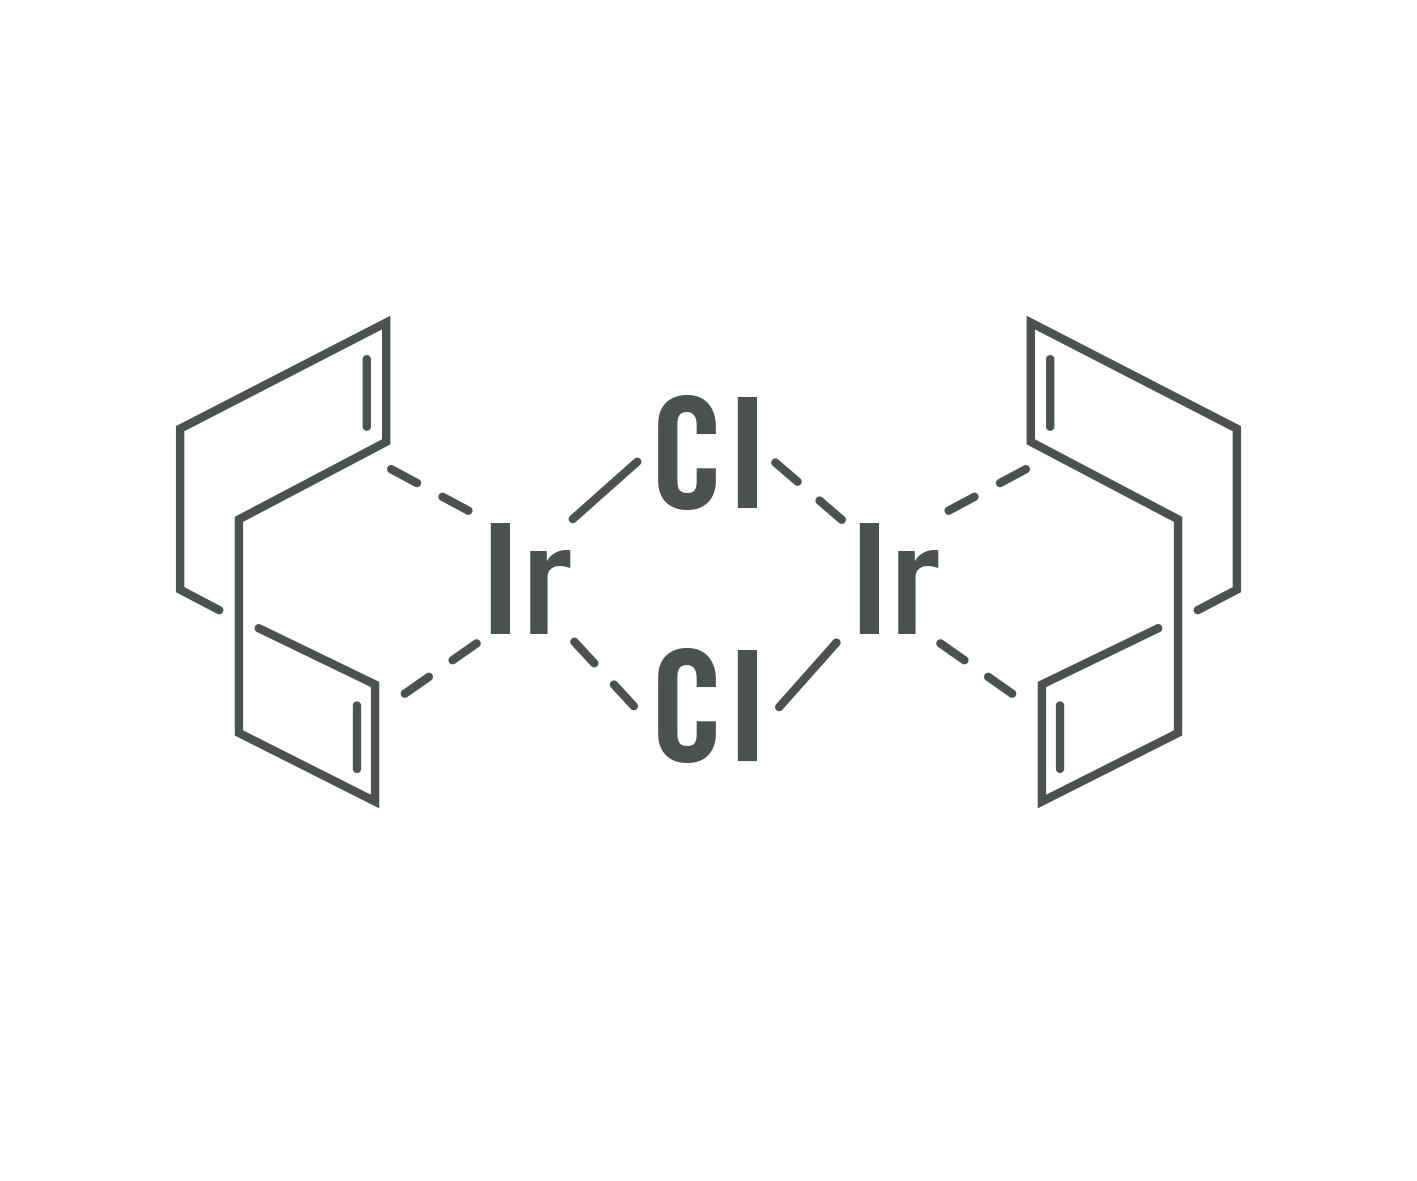 Di-µ-chloro-bis[(cycloocta-1,5-diene)iridium(I)]